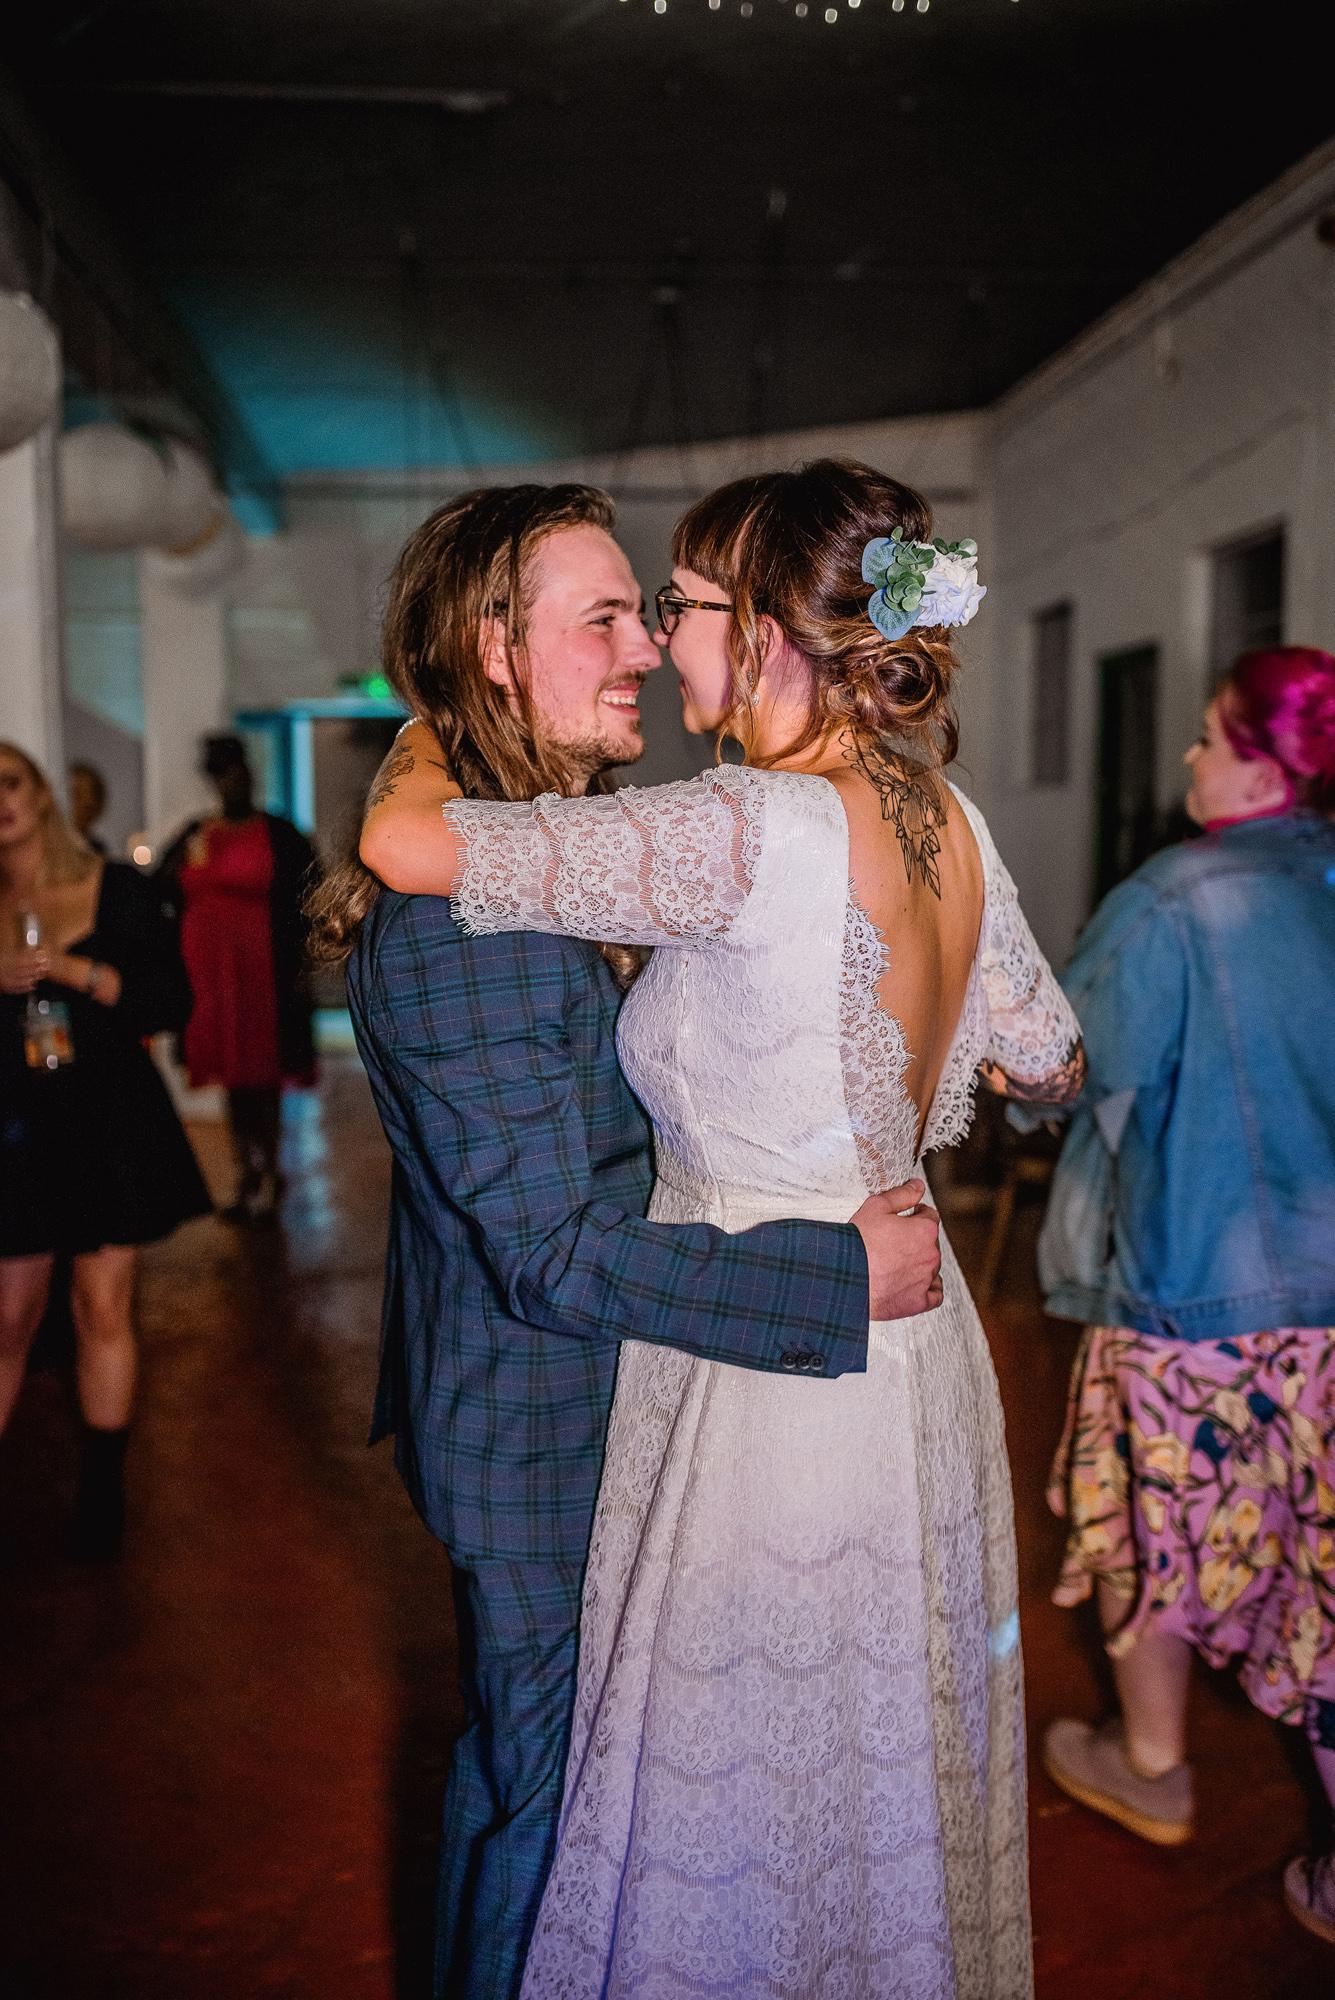 Harriet-Dahlia-Bespoke-Lace-Silk-Bohemian-Wedding-Dress-Sleeves-Tattooed-Bride-Alternative-Wedding-Sheffield-43.jpg